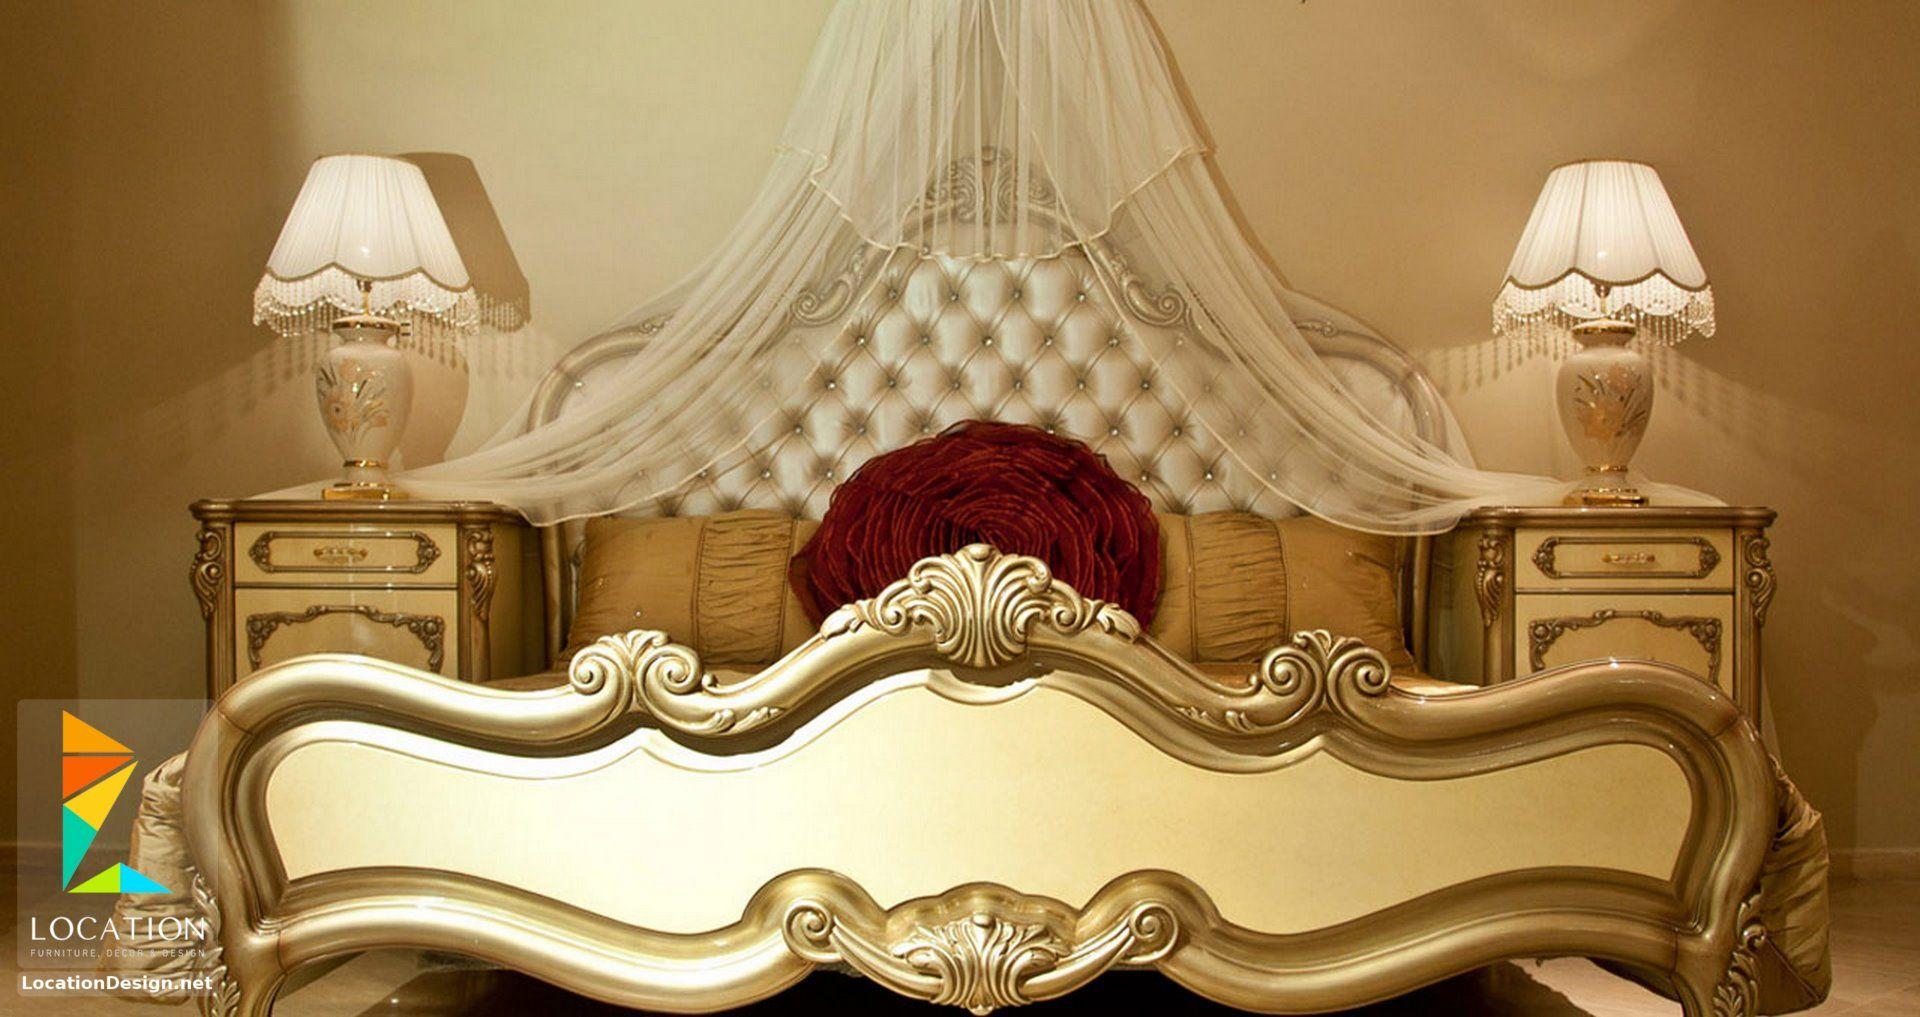 صور غرف نوم 2019 كامله احدث تصميمات غرف النوم للعرسان لوكشين ديزين نت Home Decor Decor Furniture